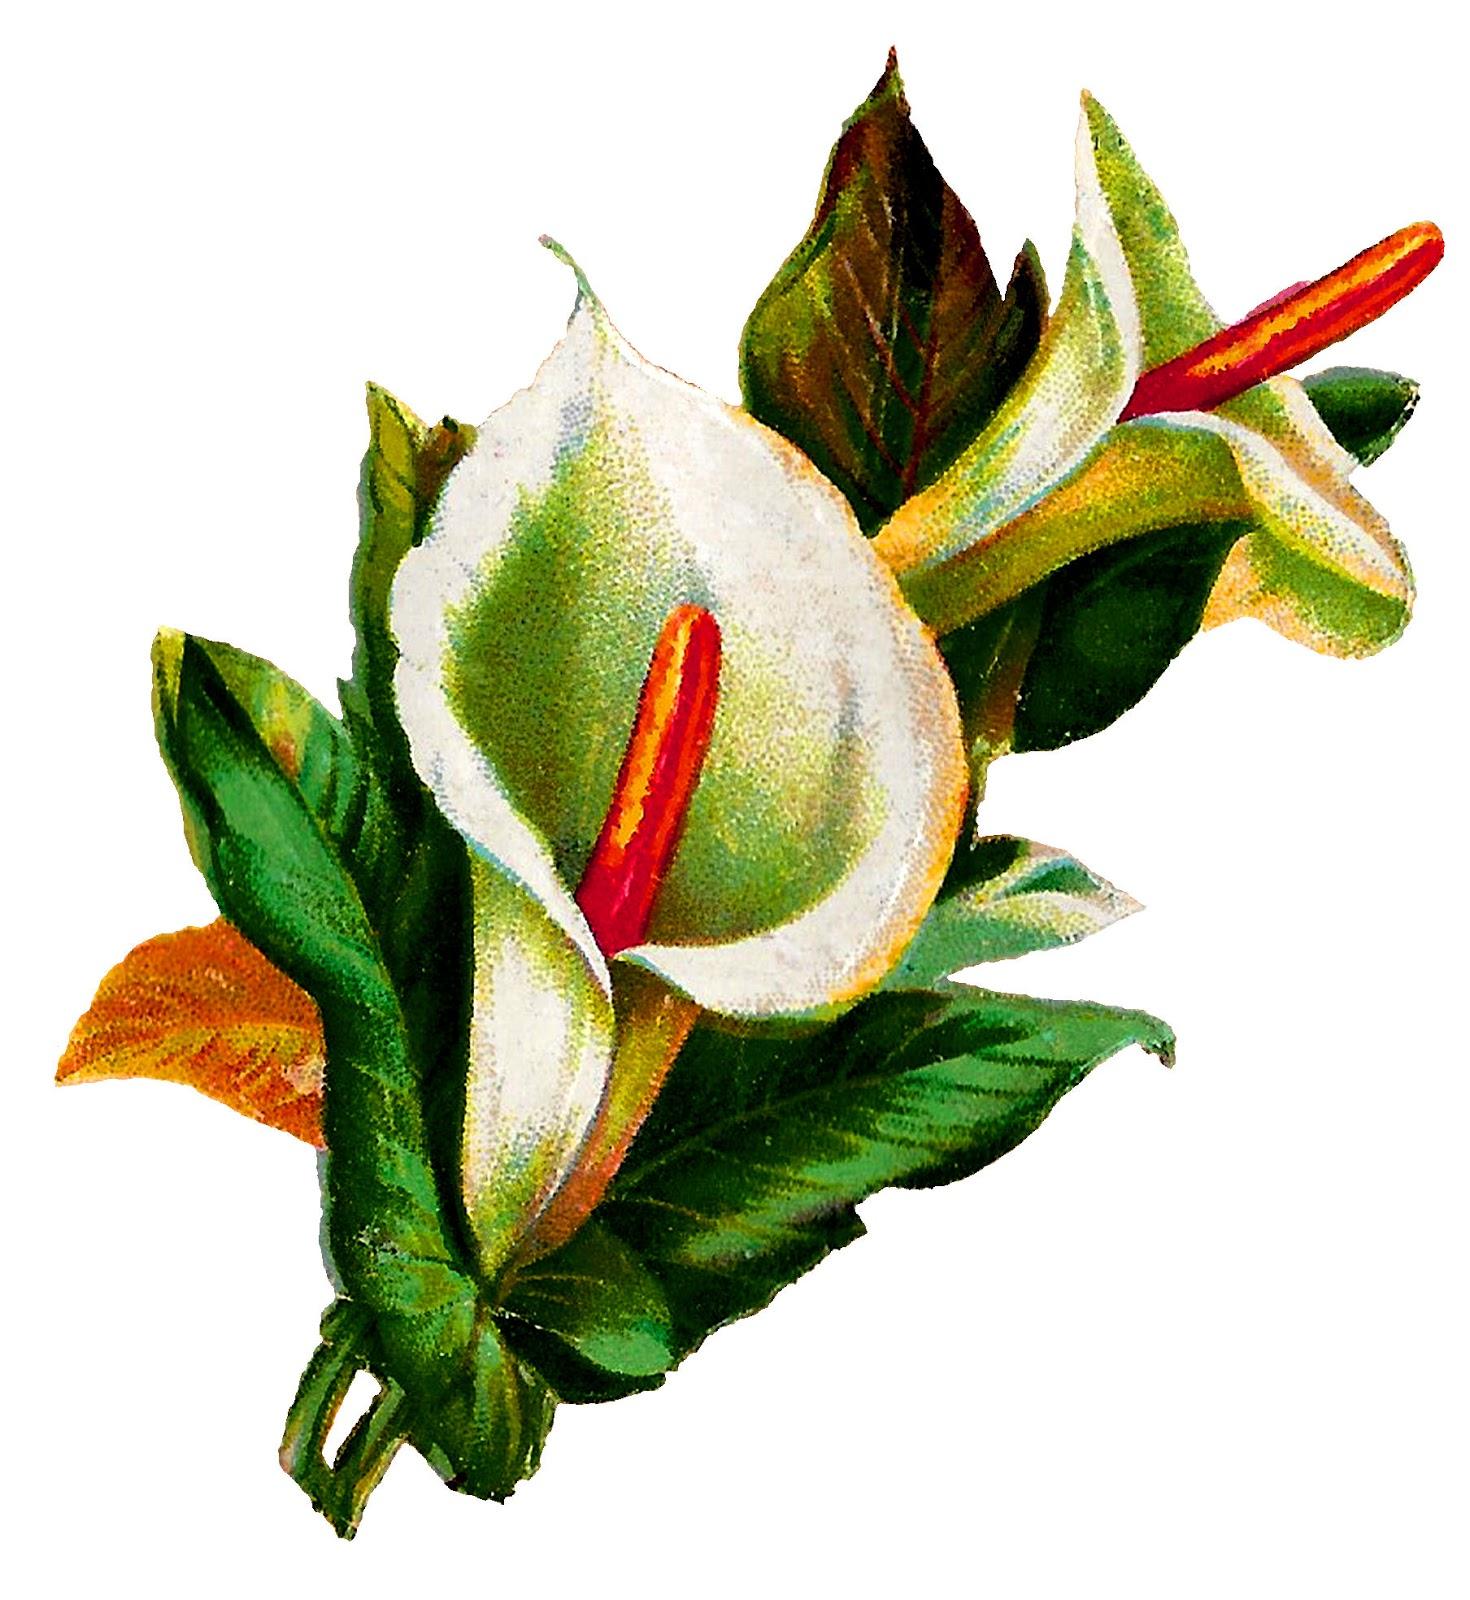 Antique images calla lily flower digital clip art botanical calla lily flower digital clip art botanical illustration image izmirmasajfo